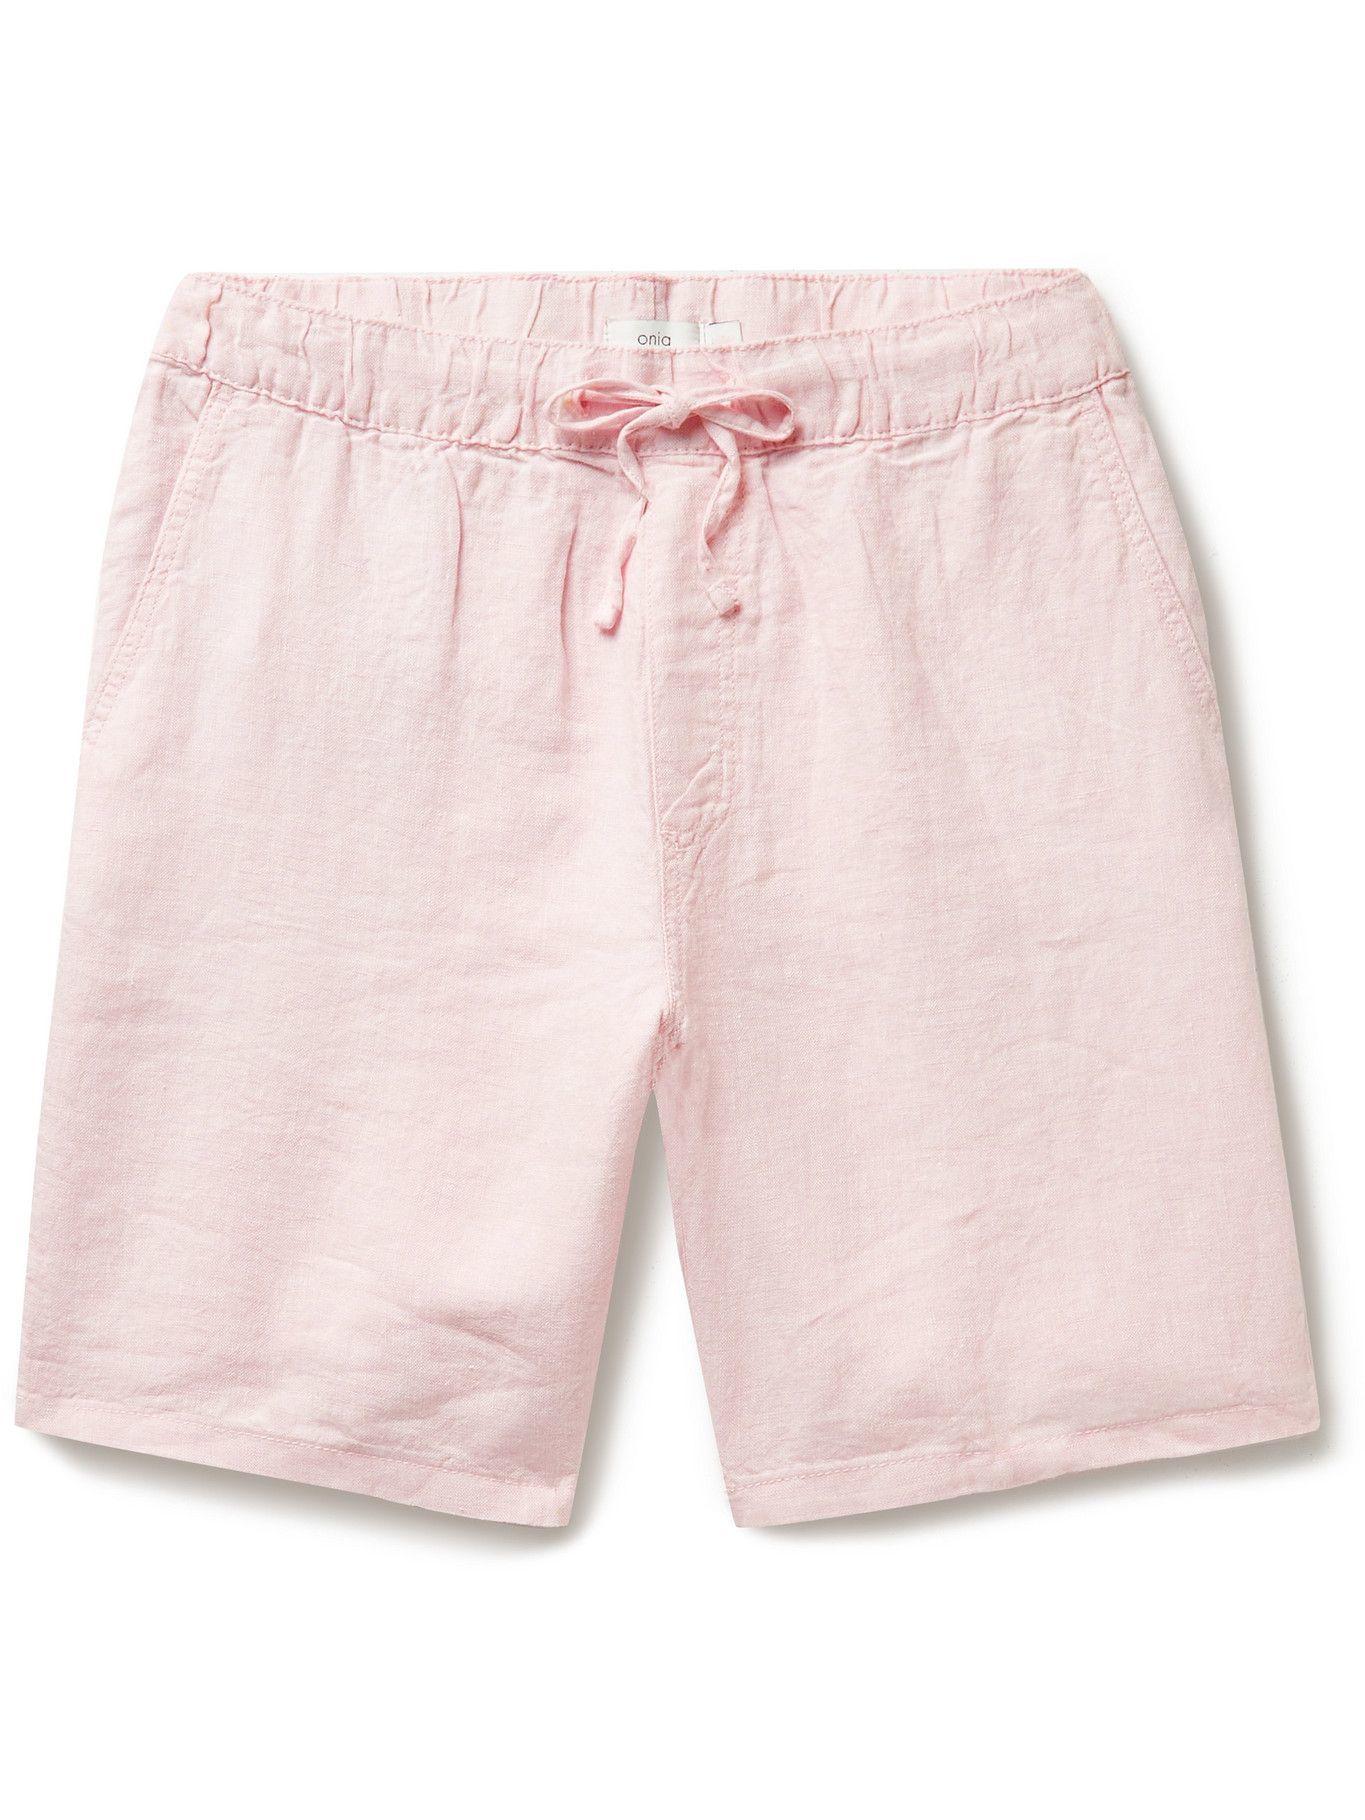 Photo: ONIA - Noah Slub Linen-Blend Drawstring Shorts - Pink